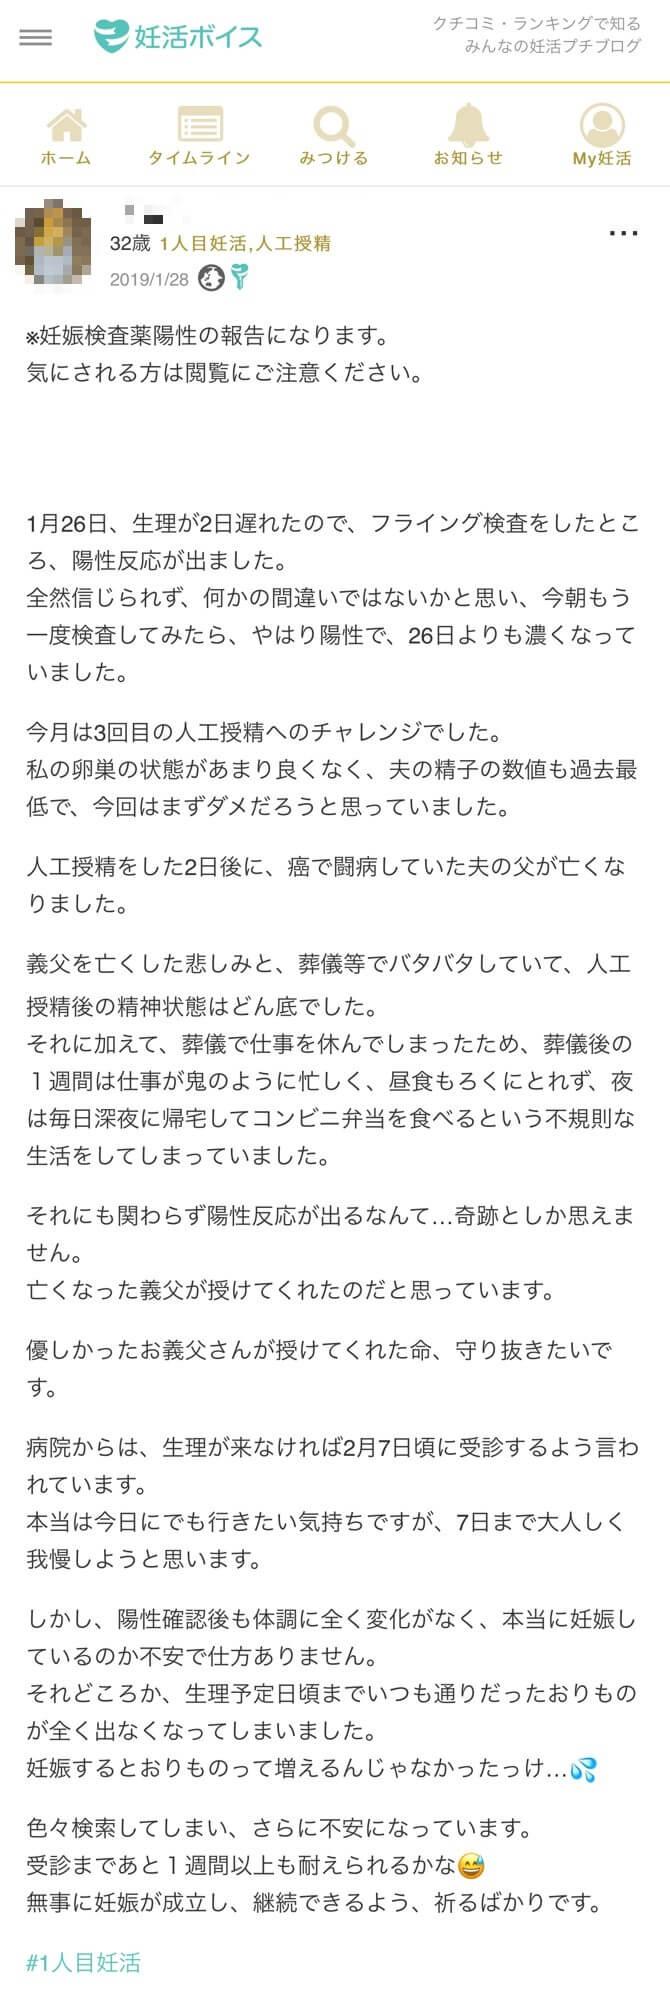 Kさん(32歳・1人目妊活・人工授精)